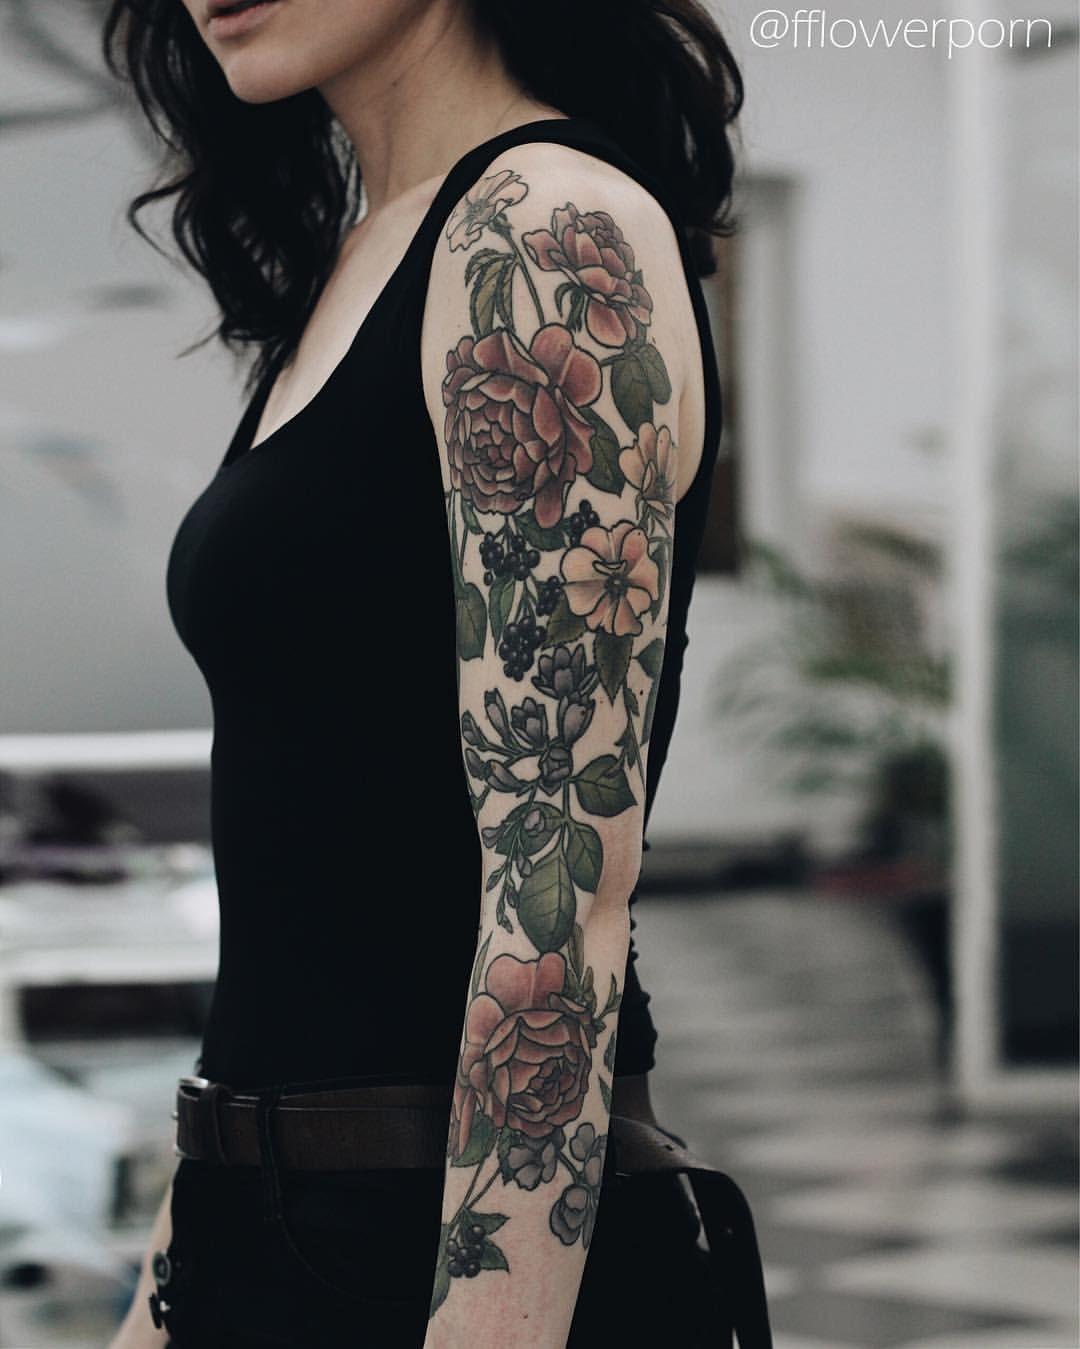 Tattoo Lena Katina caused scandal in America 08/13/2010 94